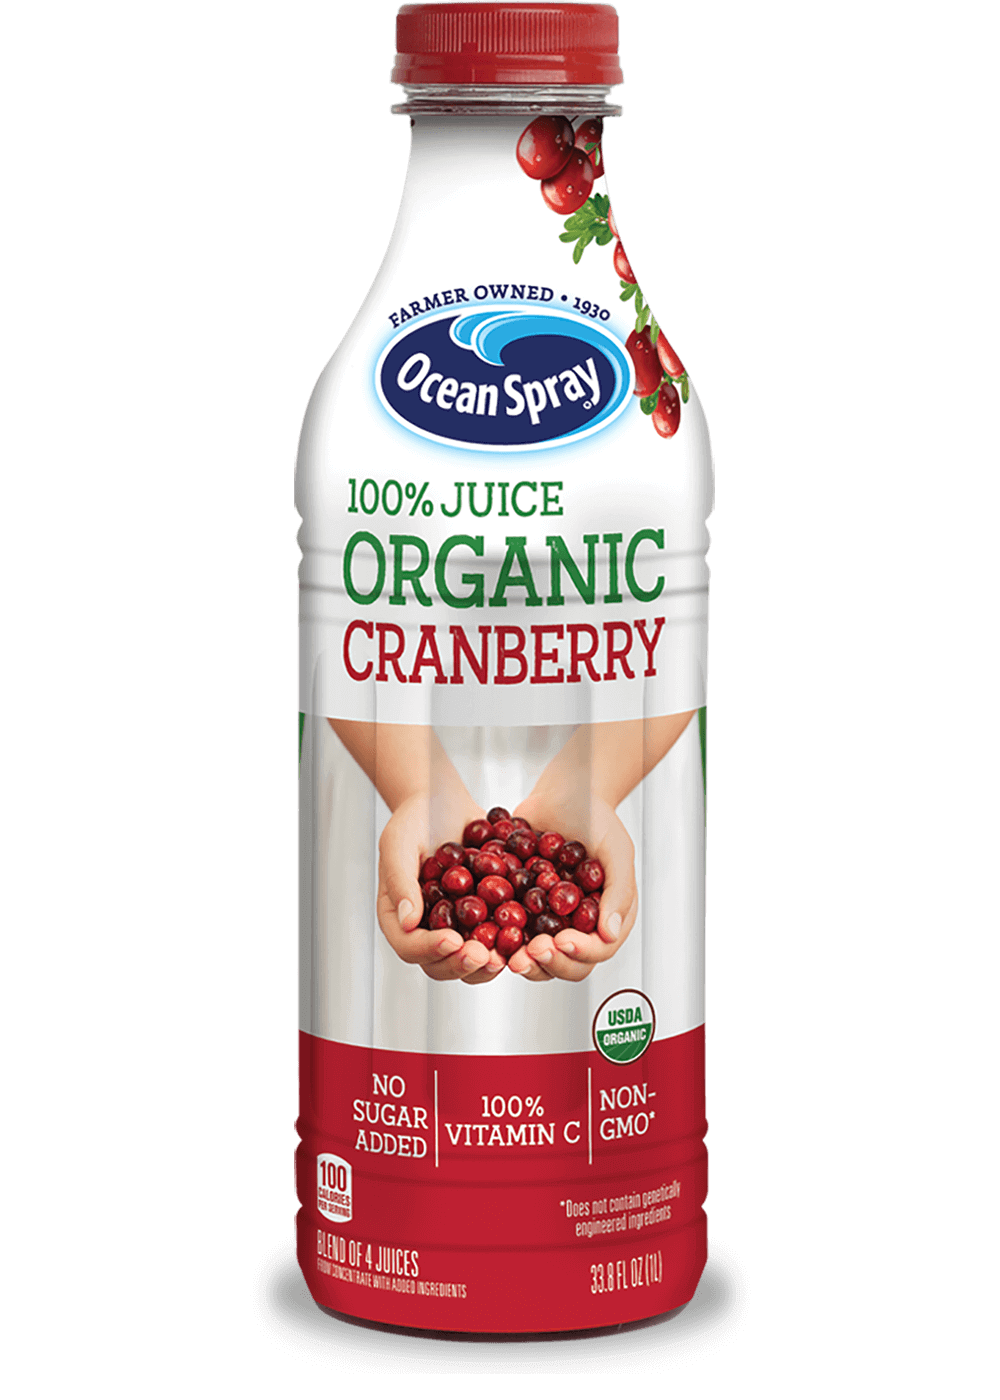 100% Juice Organic Cranberry